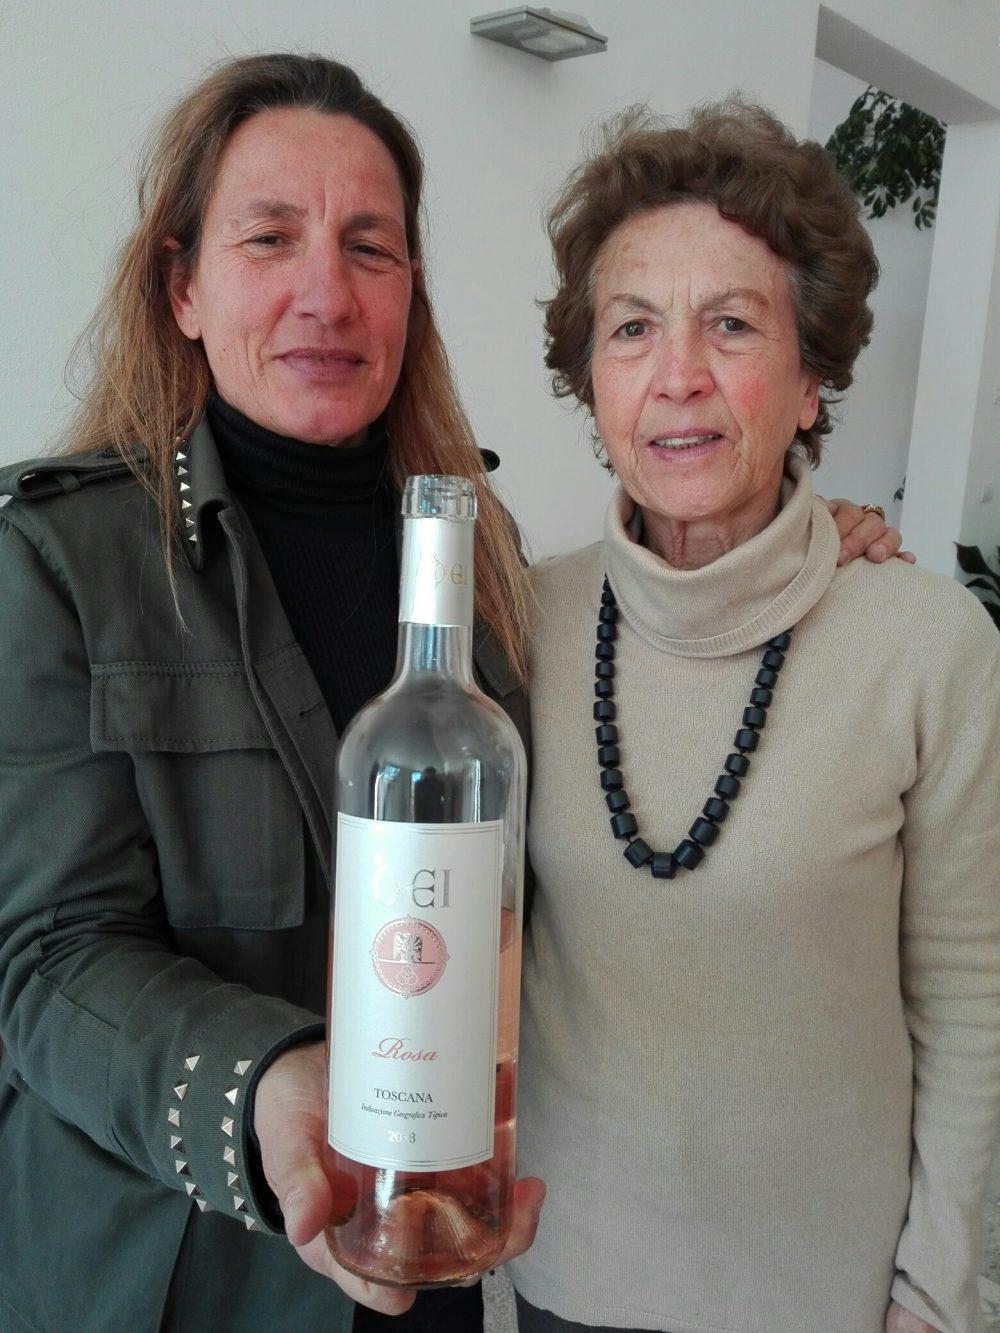 Rosa 2018 Igt Toscana Rosato Cantine Dei